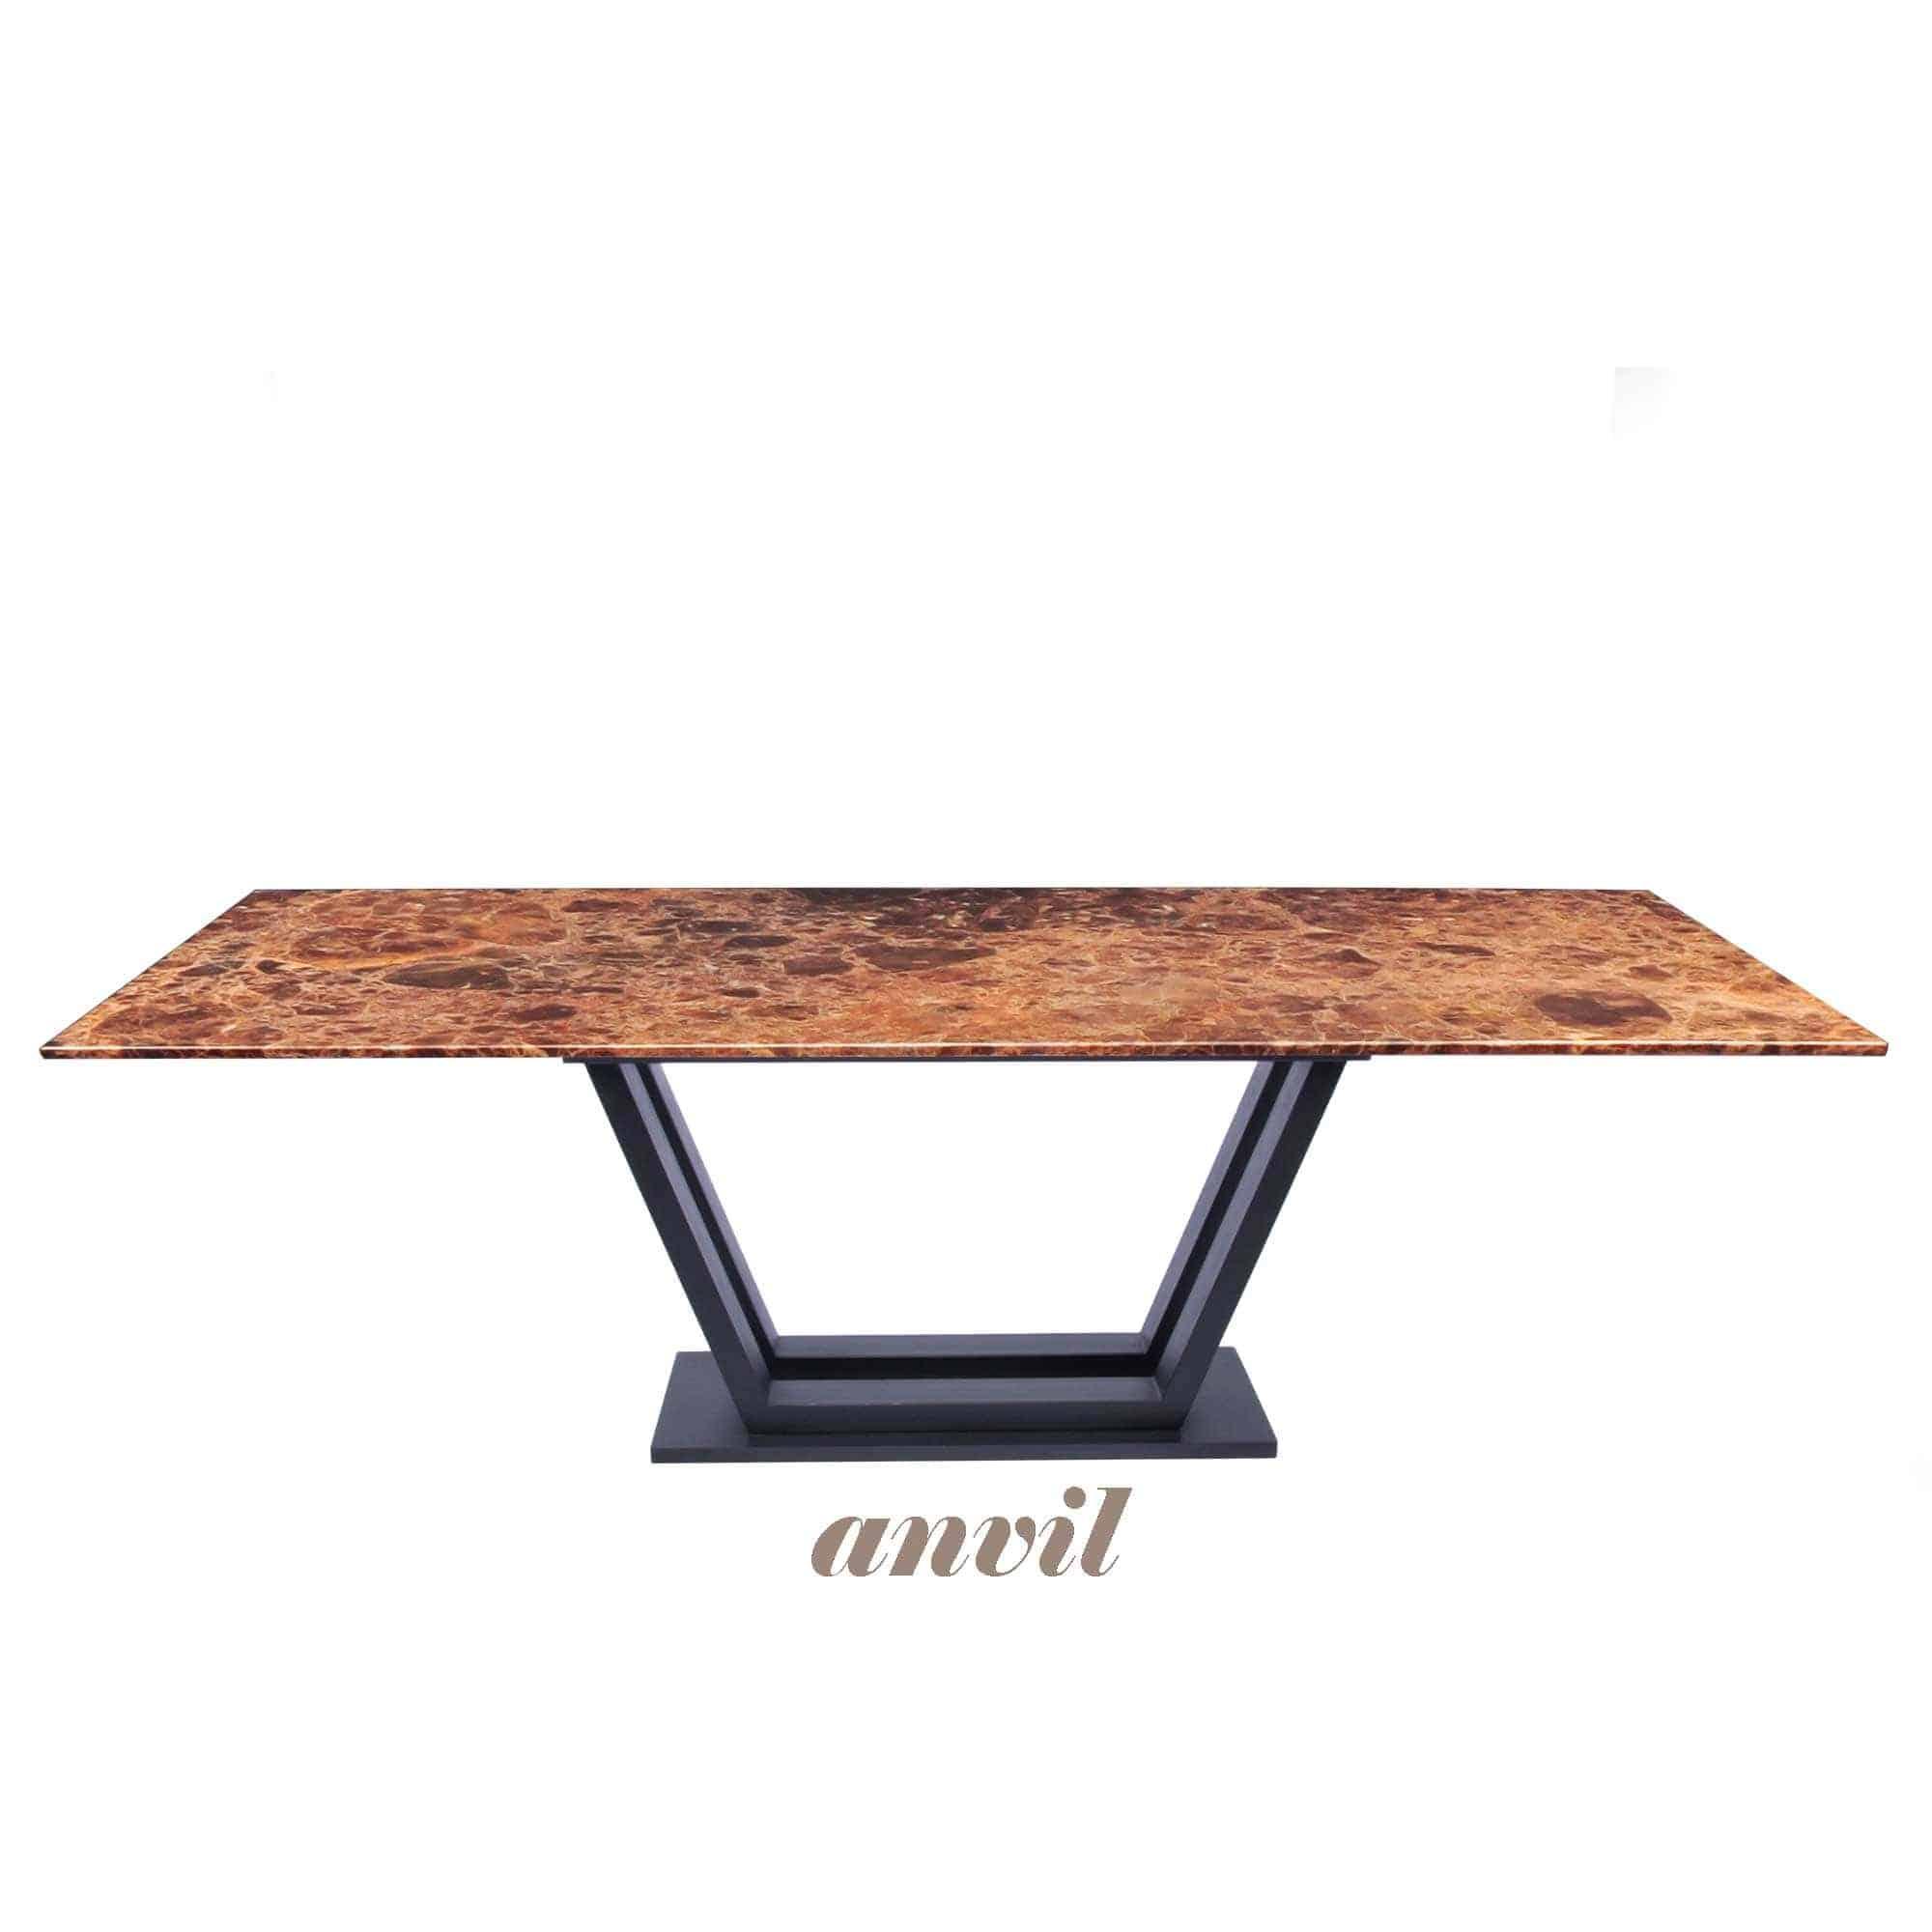 dark-emperador-dark-brown-rectangular-marble-dining-table-6-to-8-pax-decasa-marble-2100x1000mm-anvil-ms